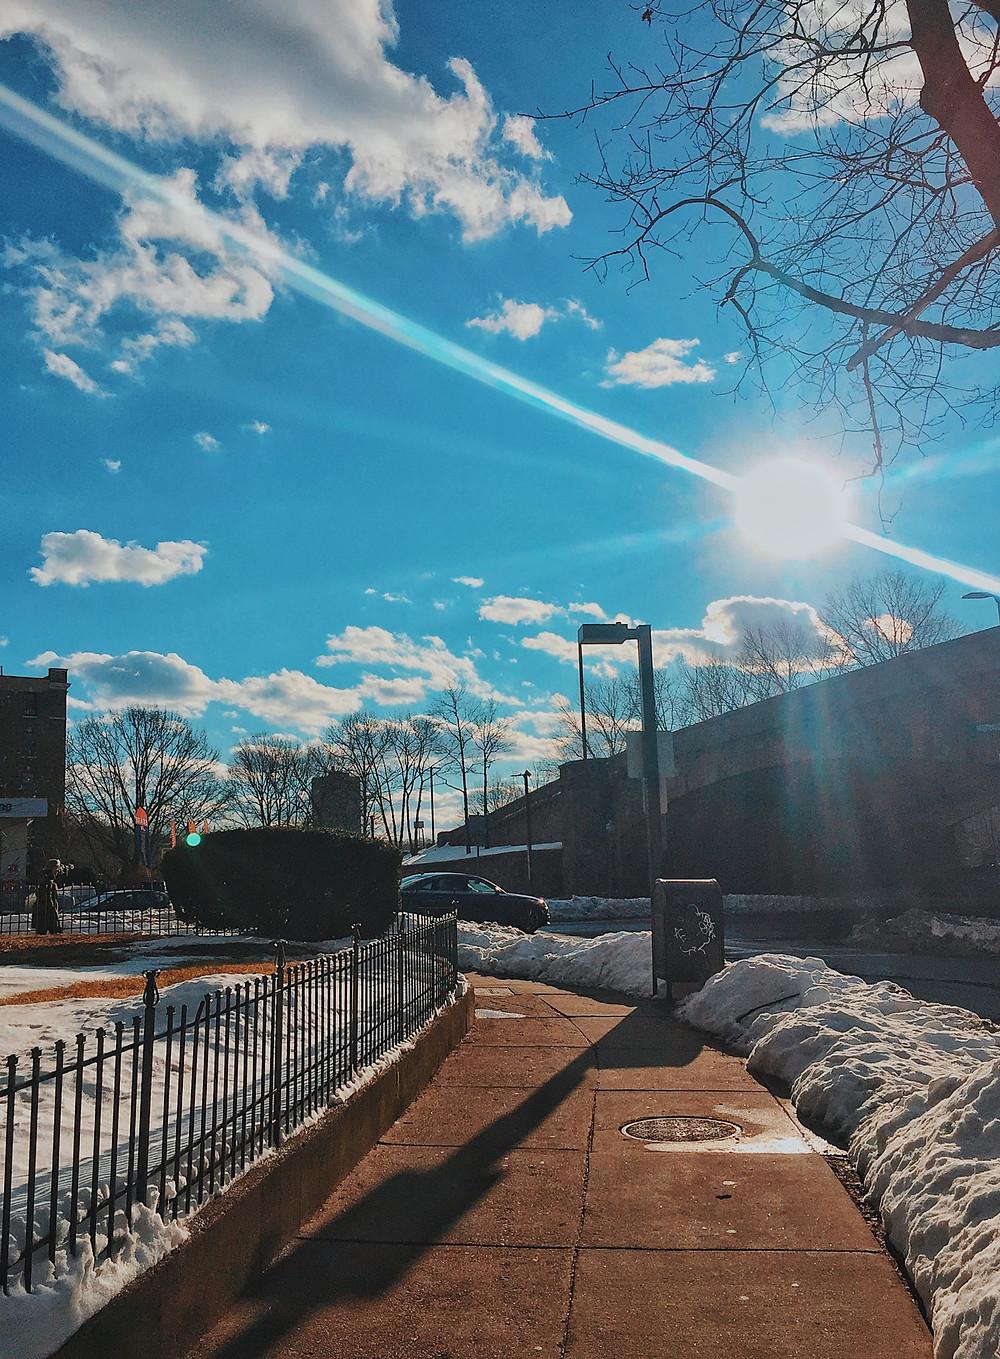 Riverway street snow cloud Boston, international students blog, alien thoughts